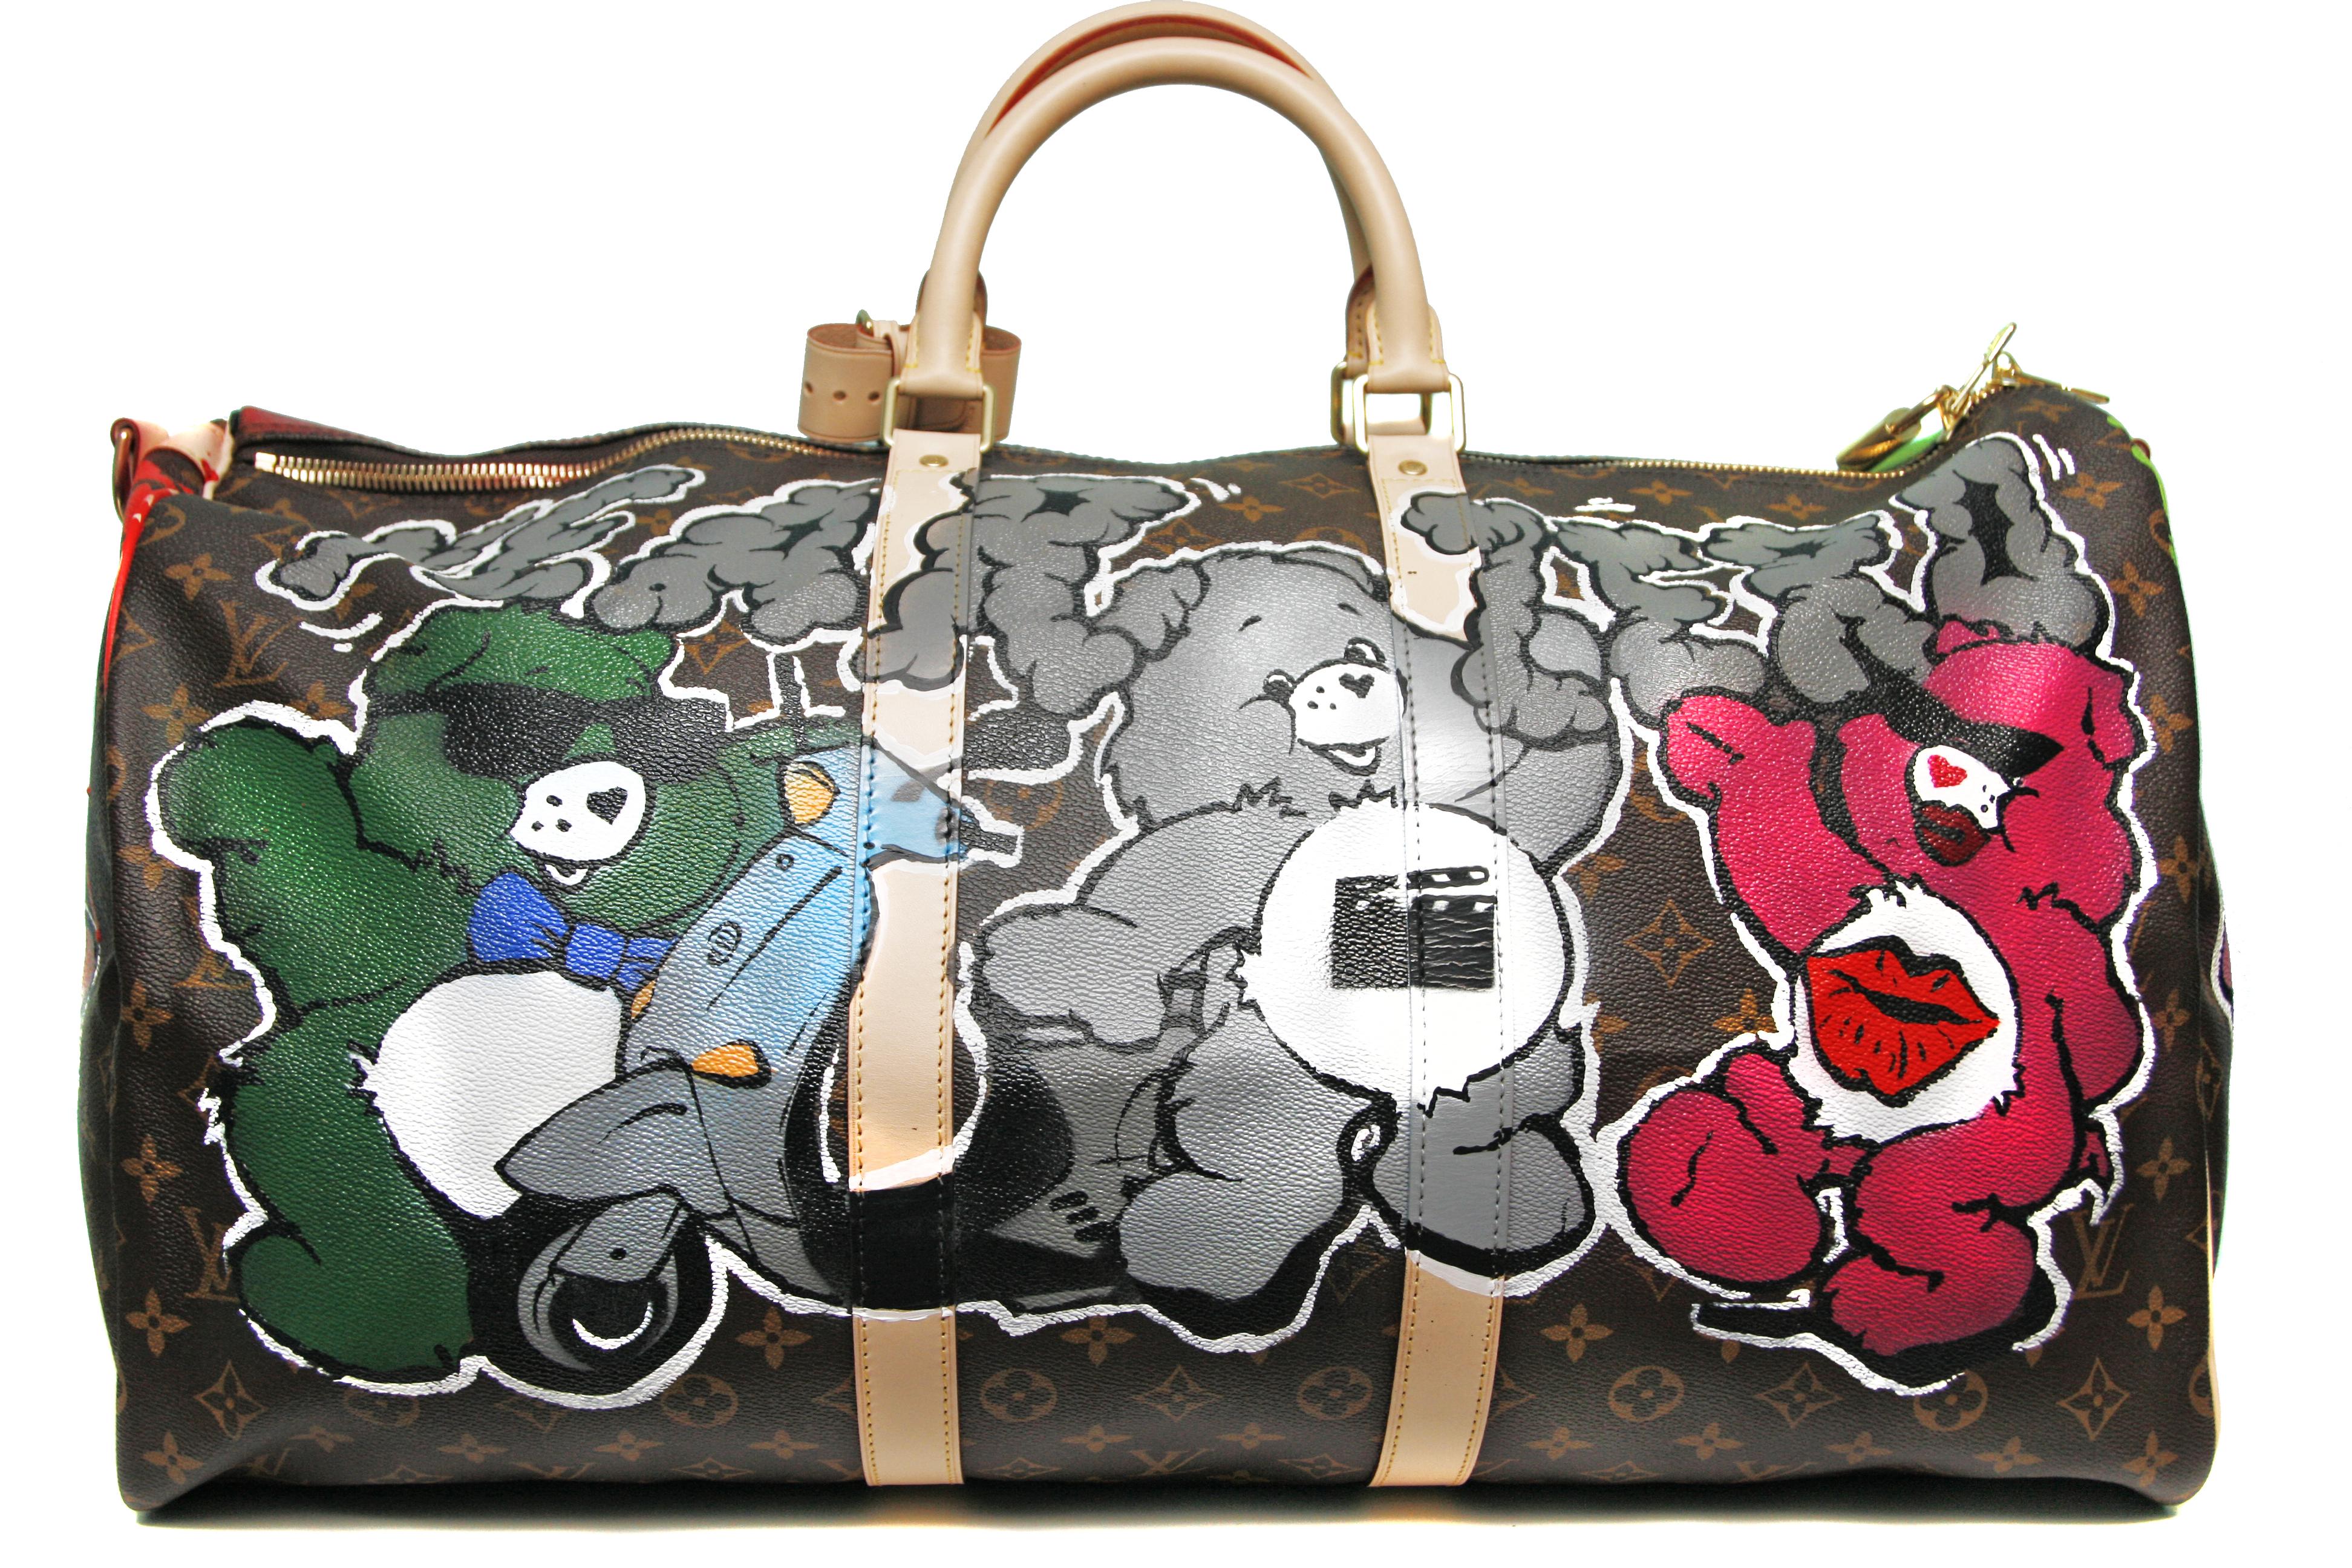 e9823faabdc4 Customize your designer handbags with